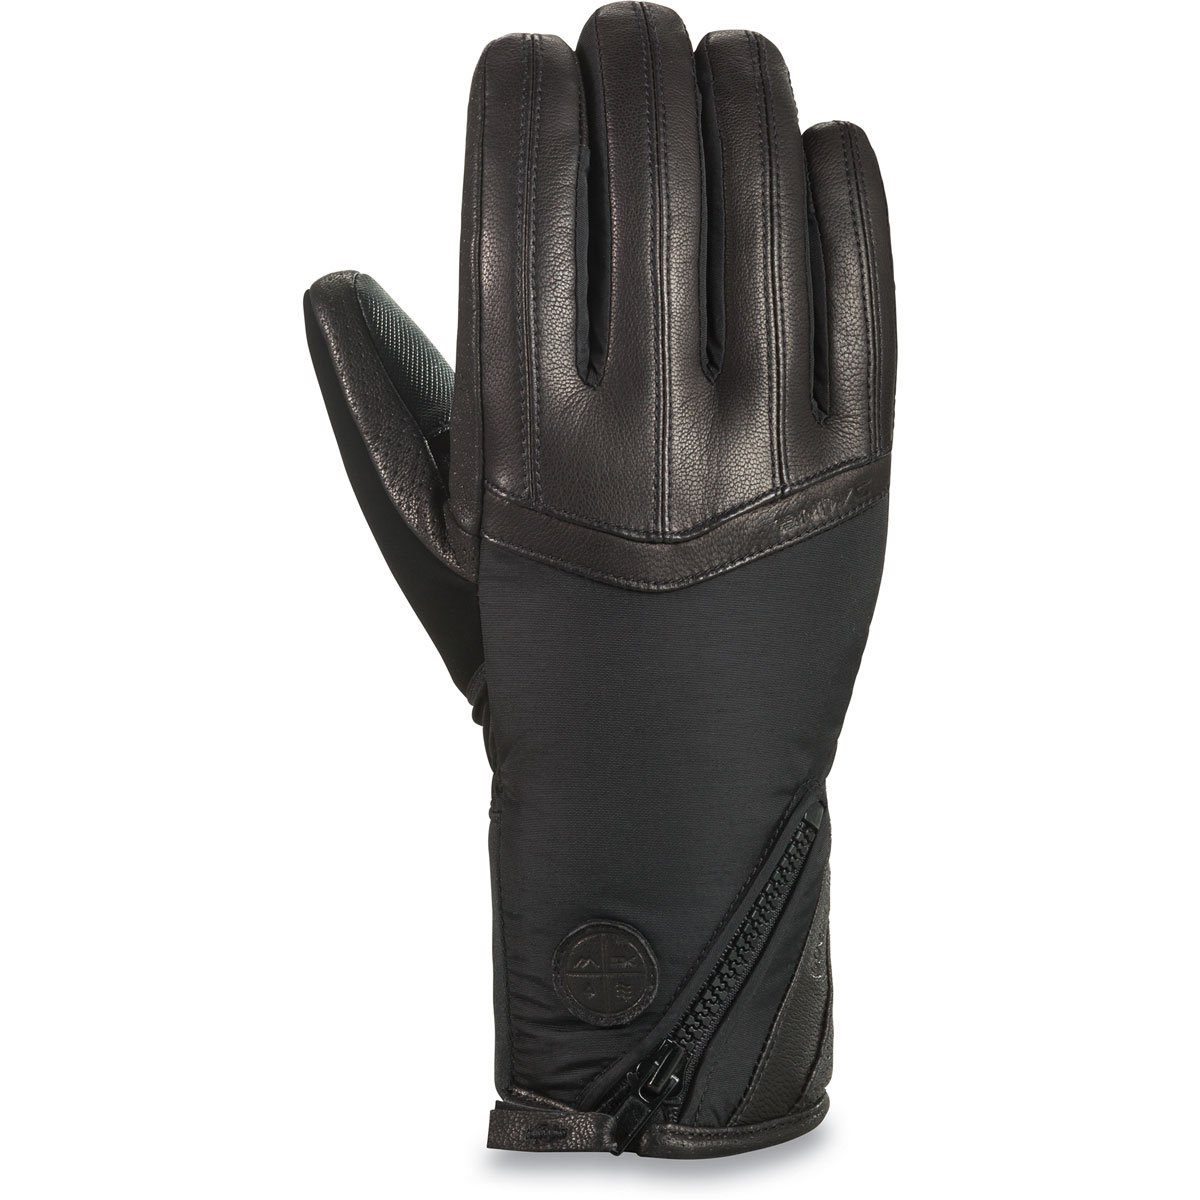 be6053b2c86aac Dakine Targa GORE-TEX Glove